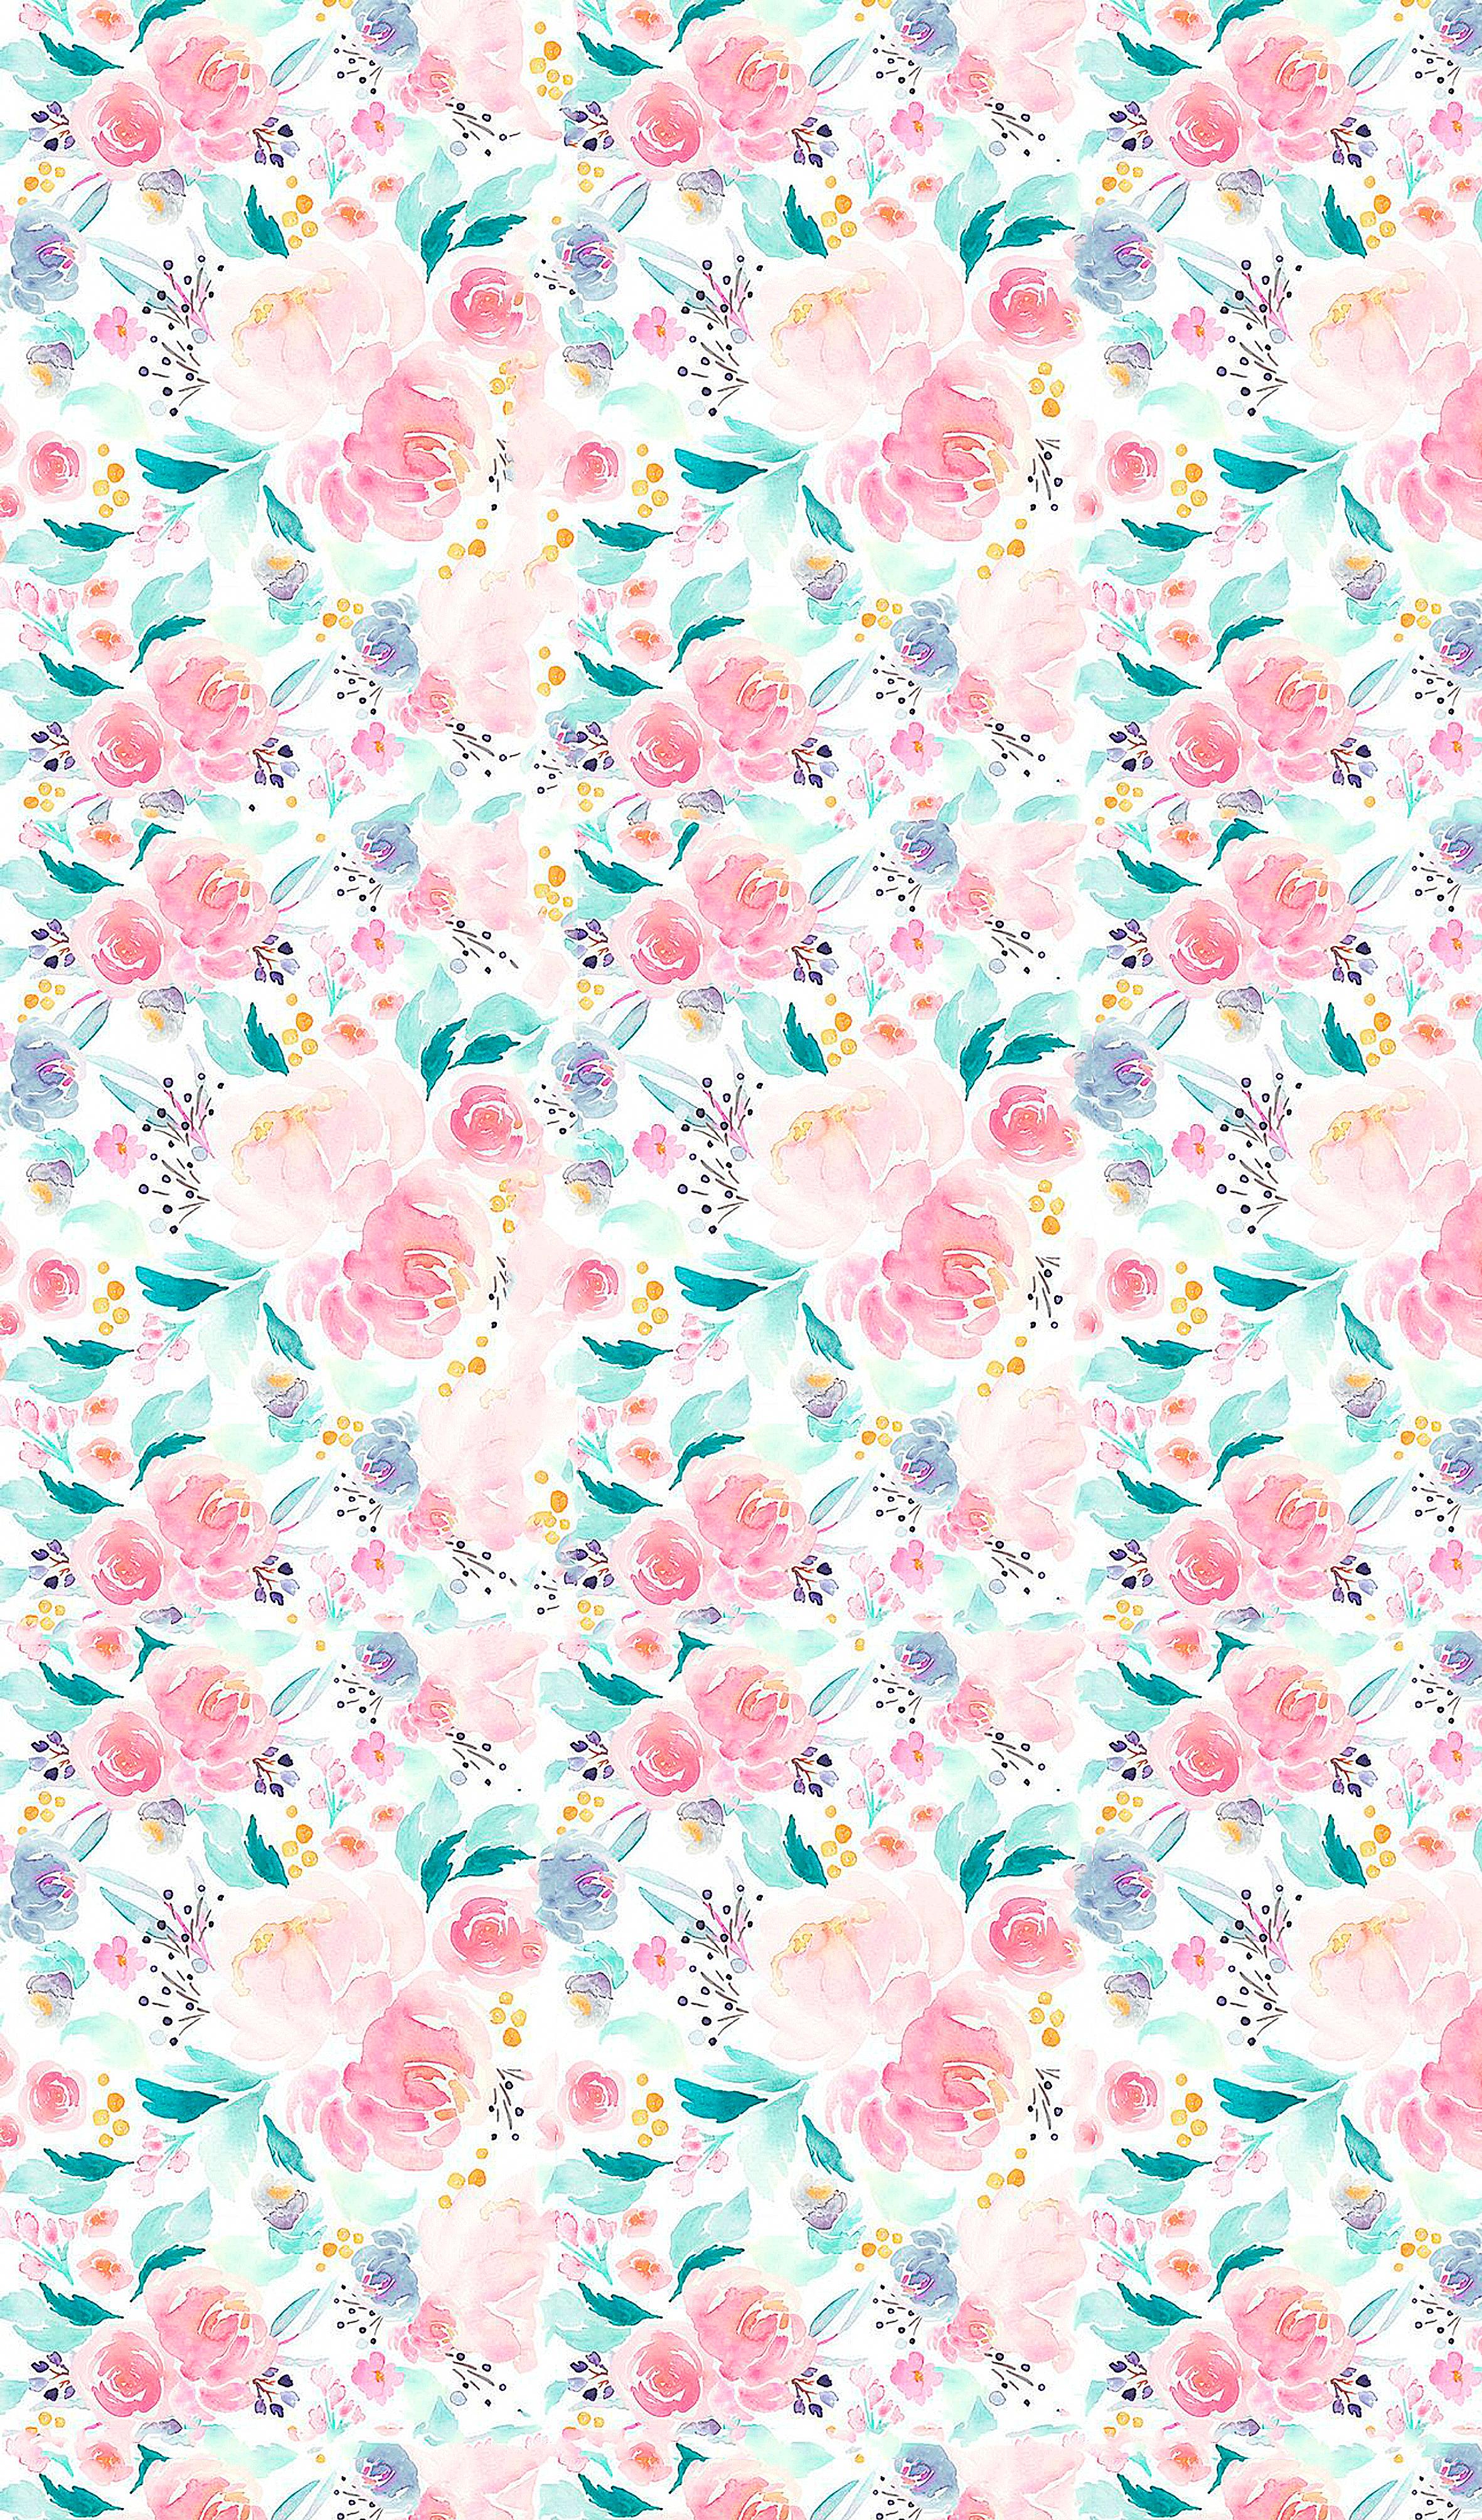 Wallpaper Iphone Iphonewallpapertumblr Vintage Flowers Wallpaper Flowery Wallpaper Wallpaper Iphone Cute